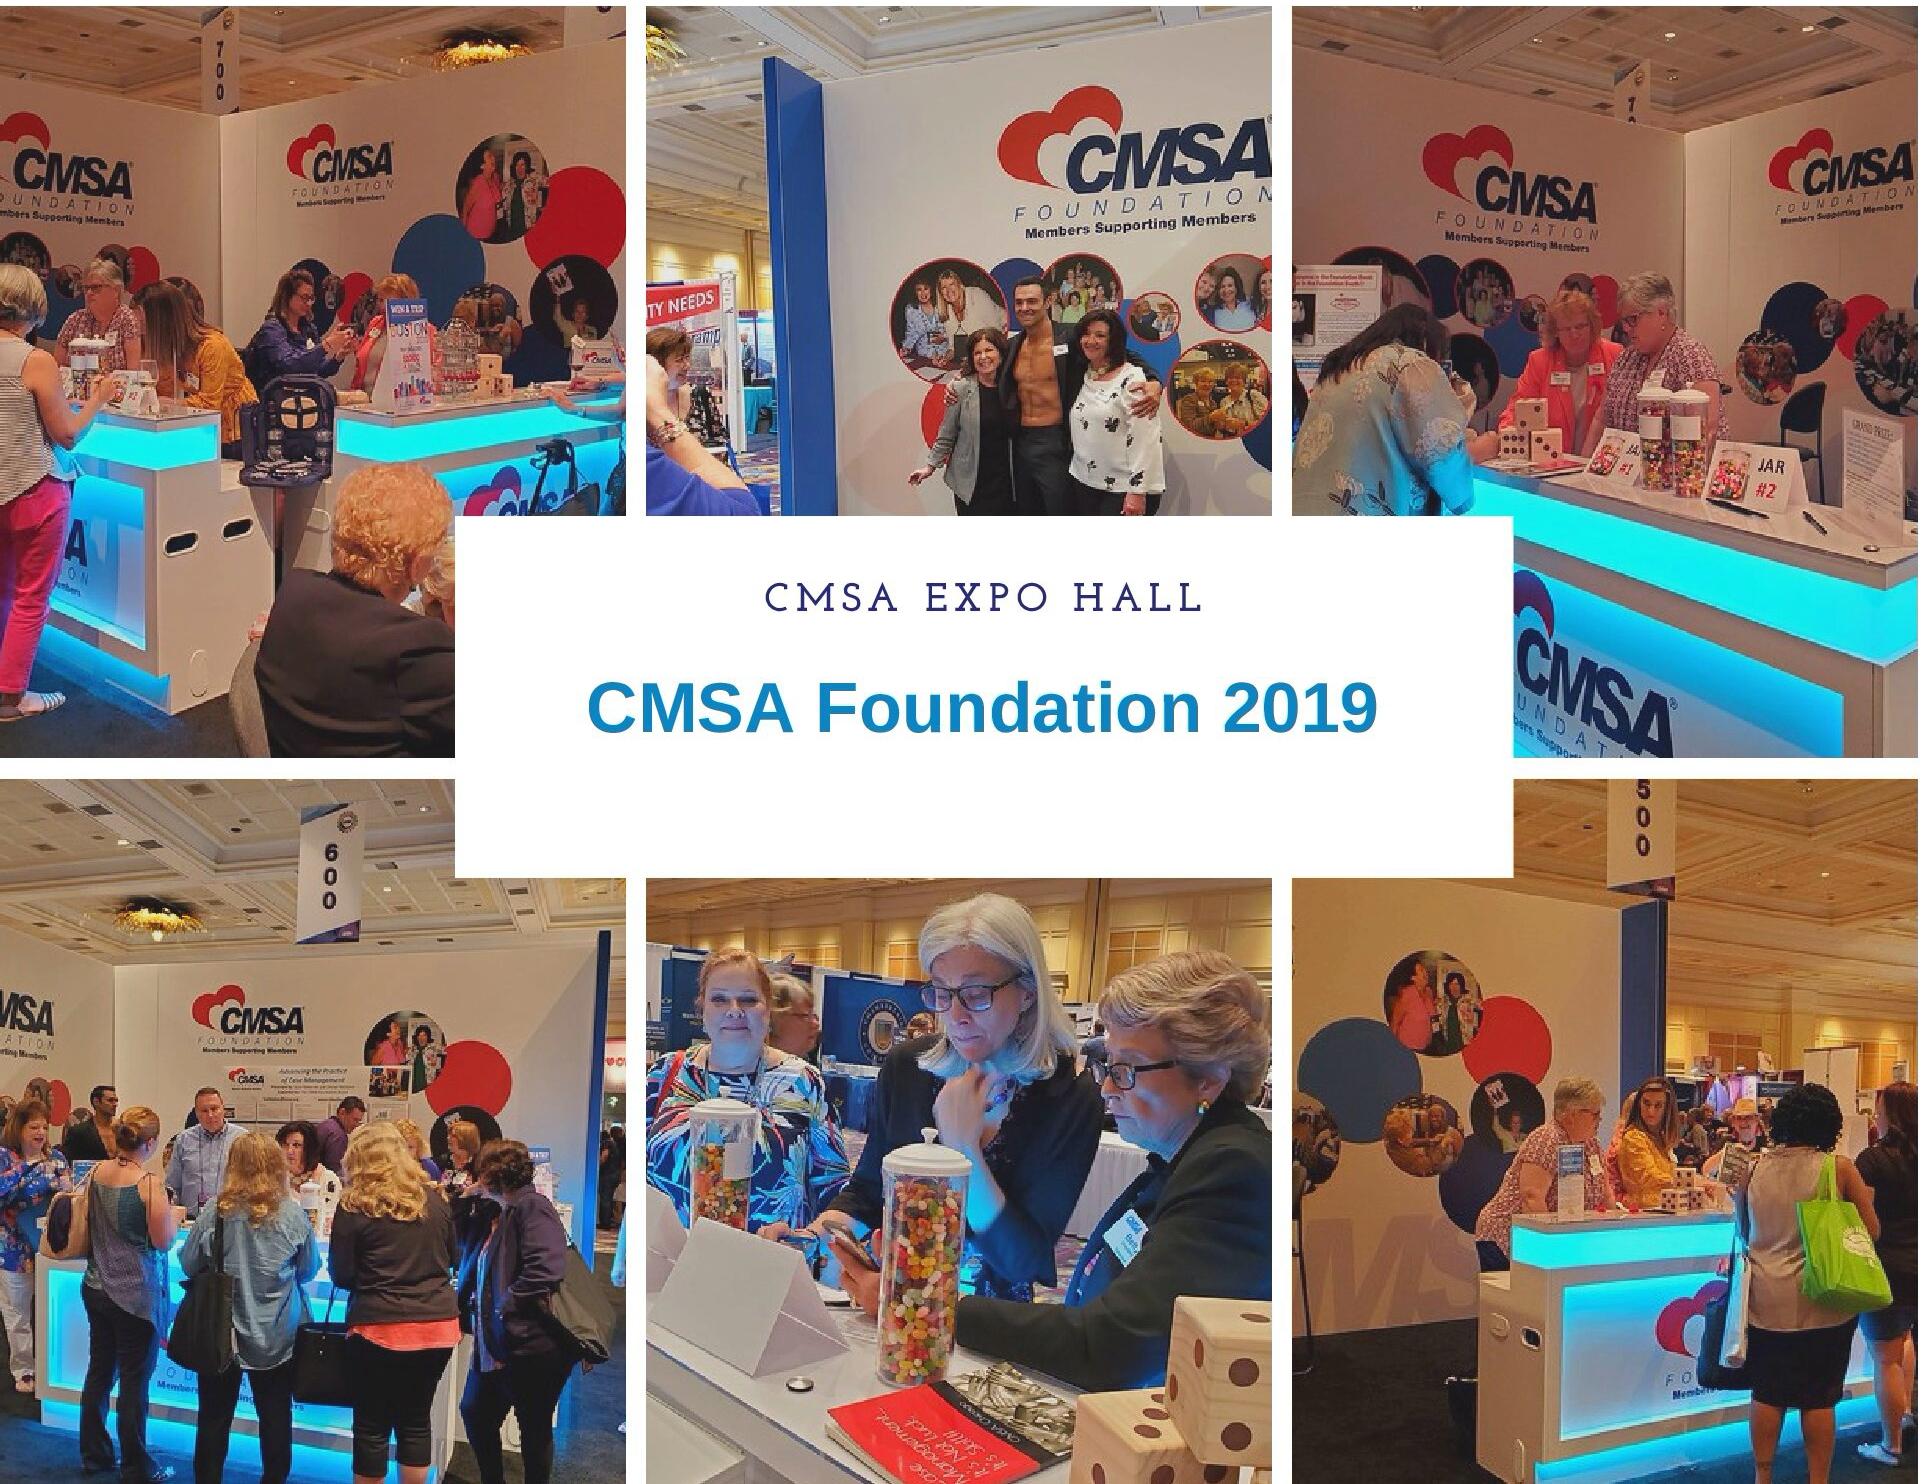 CMSA expo hall.jpg